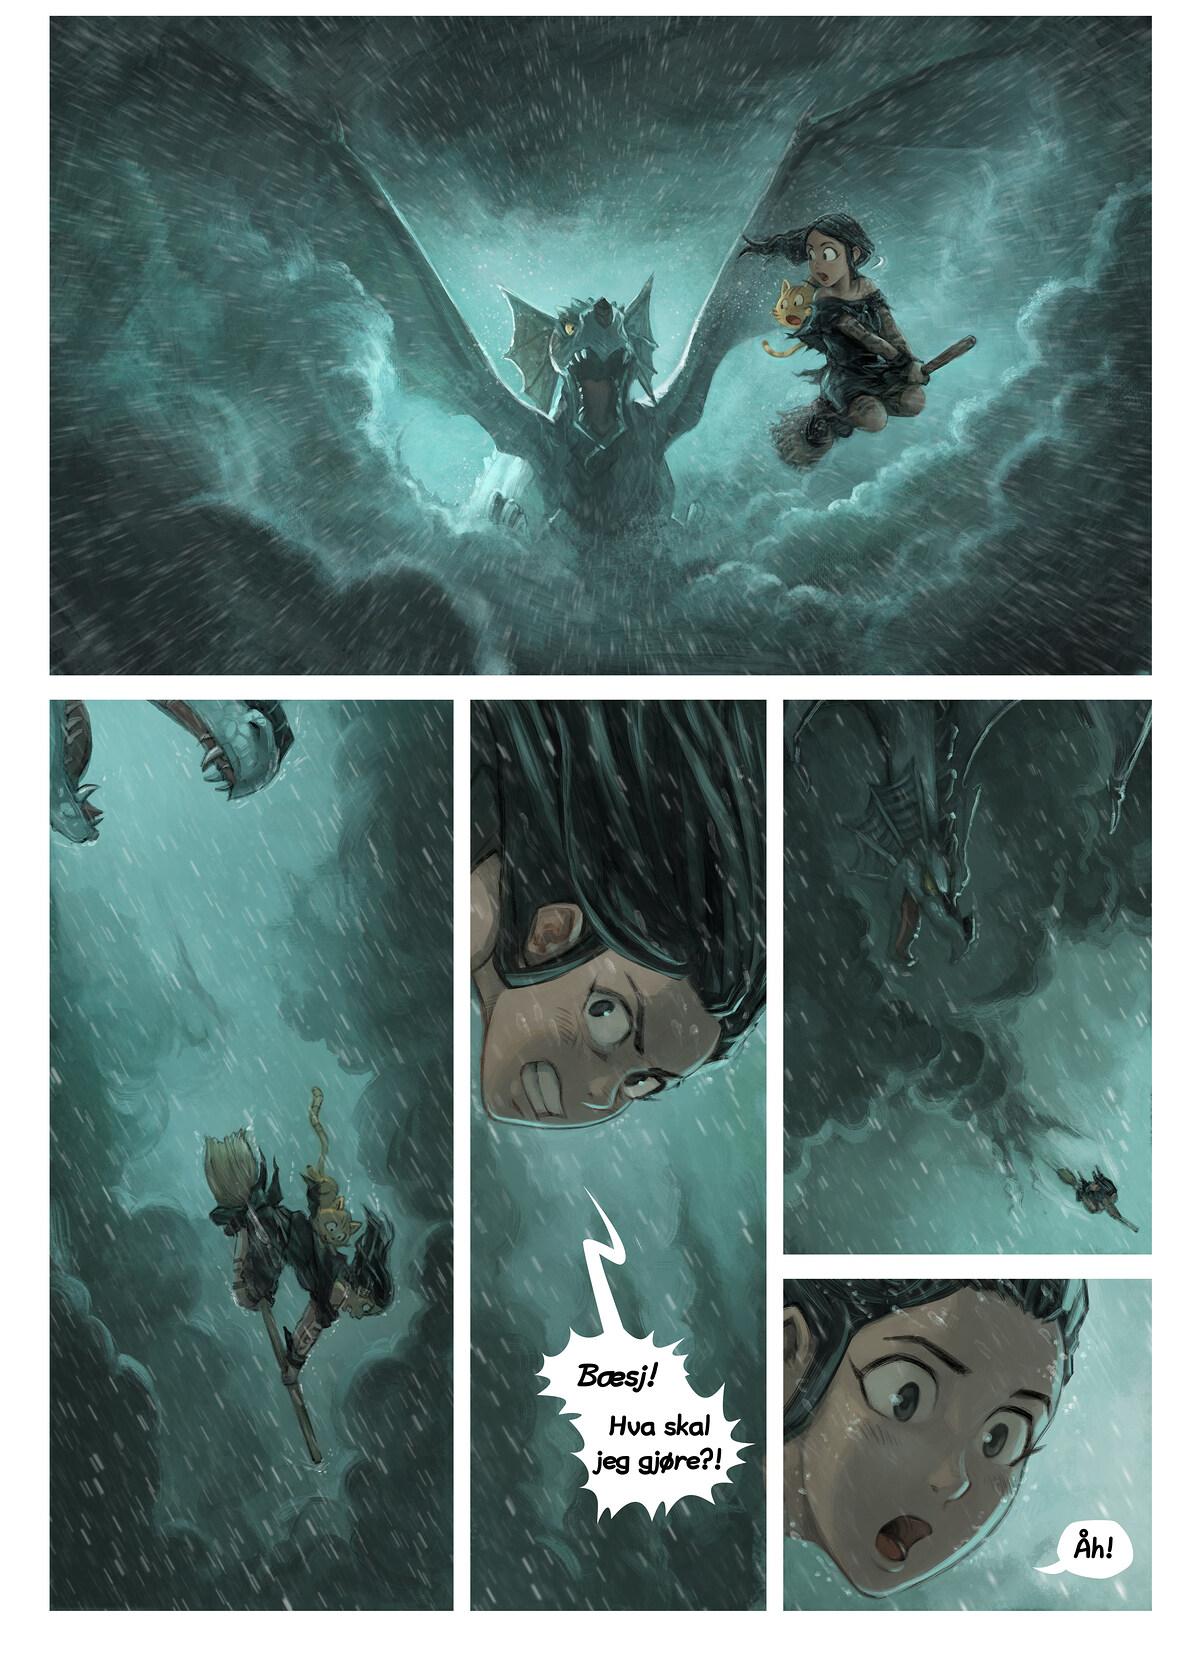 Episode 35: Tid for ettertanke, Page 5